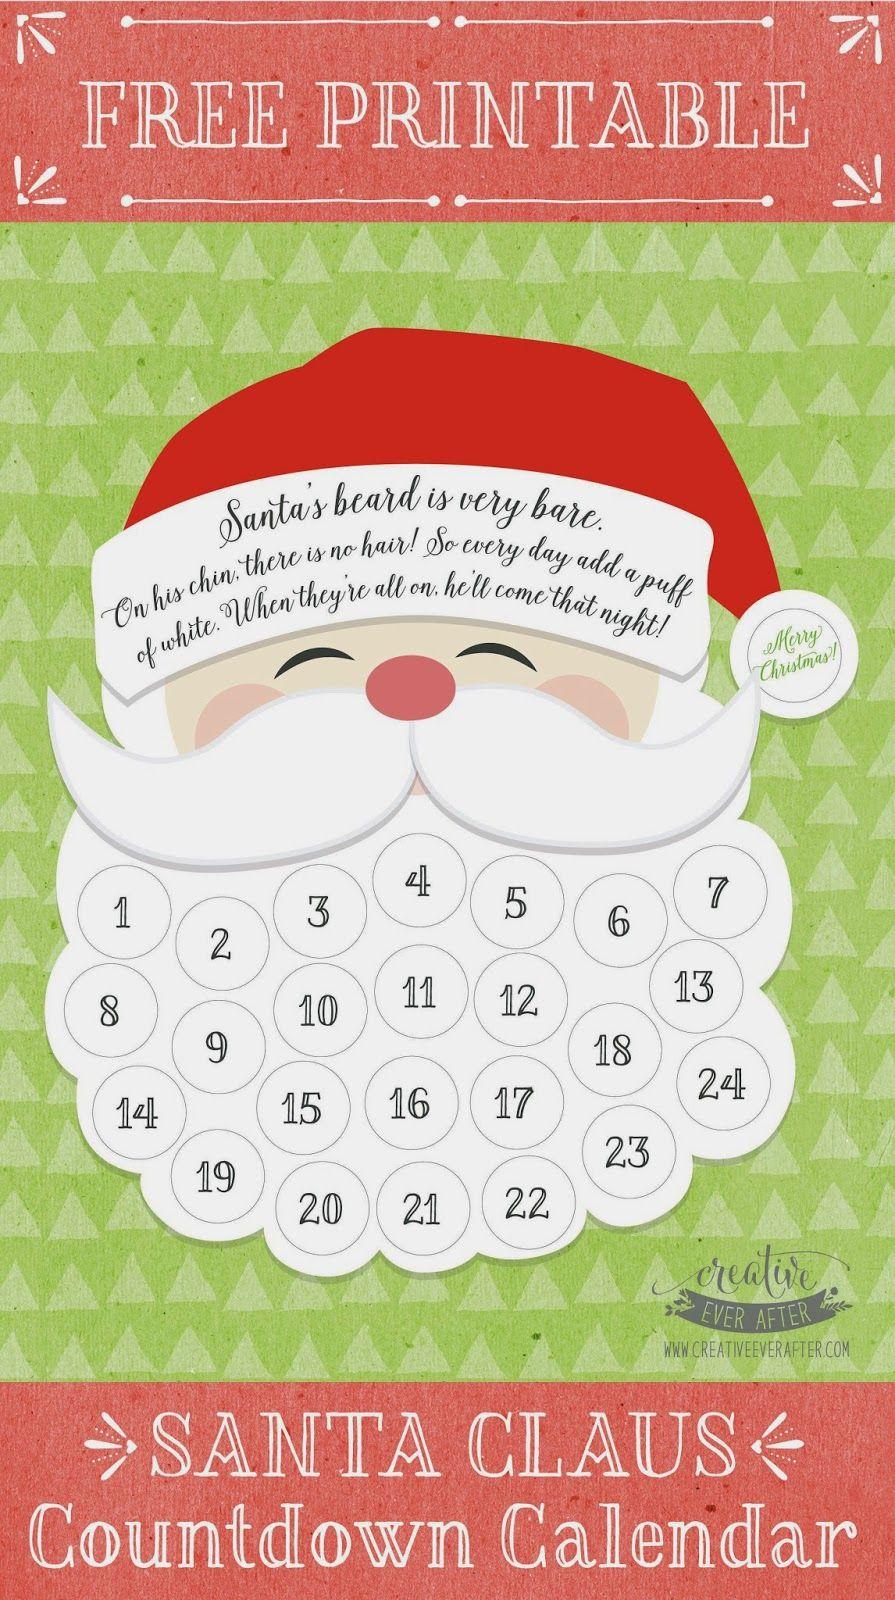 Free Printable} Santa Claus Beard Countdown Calendar